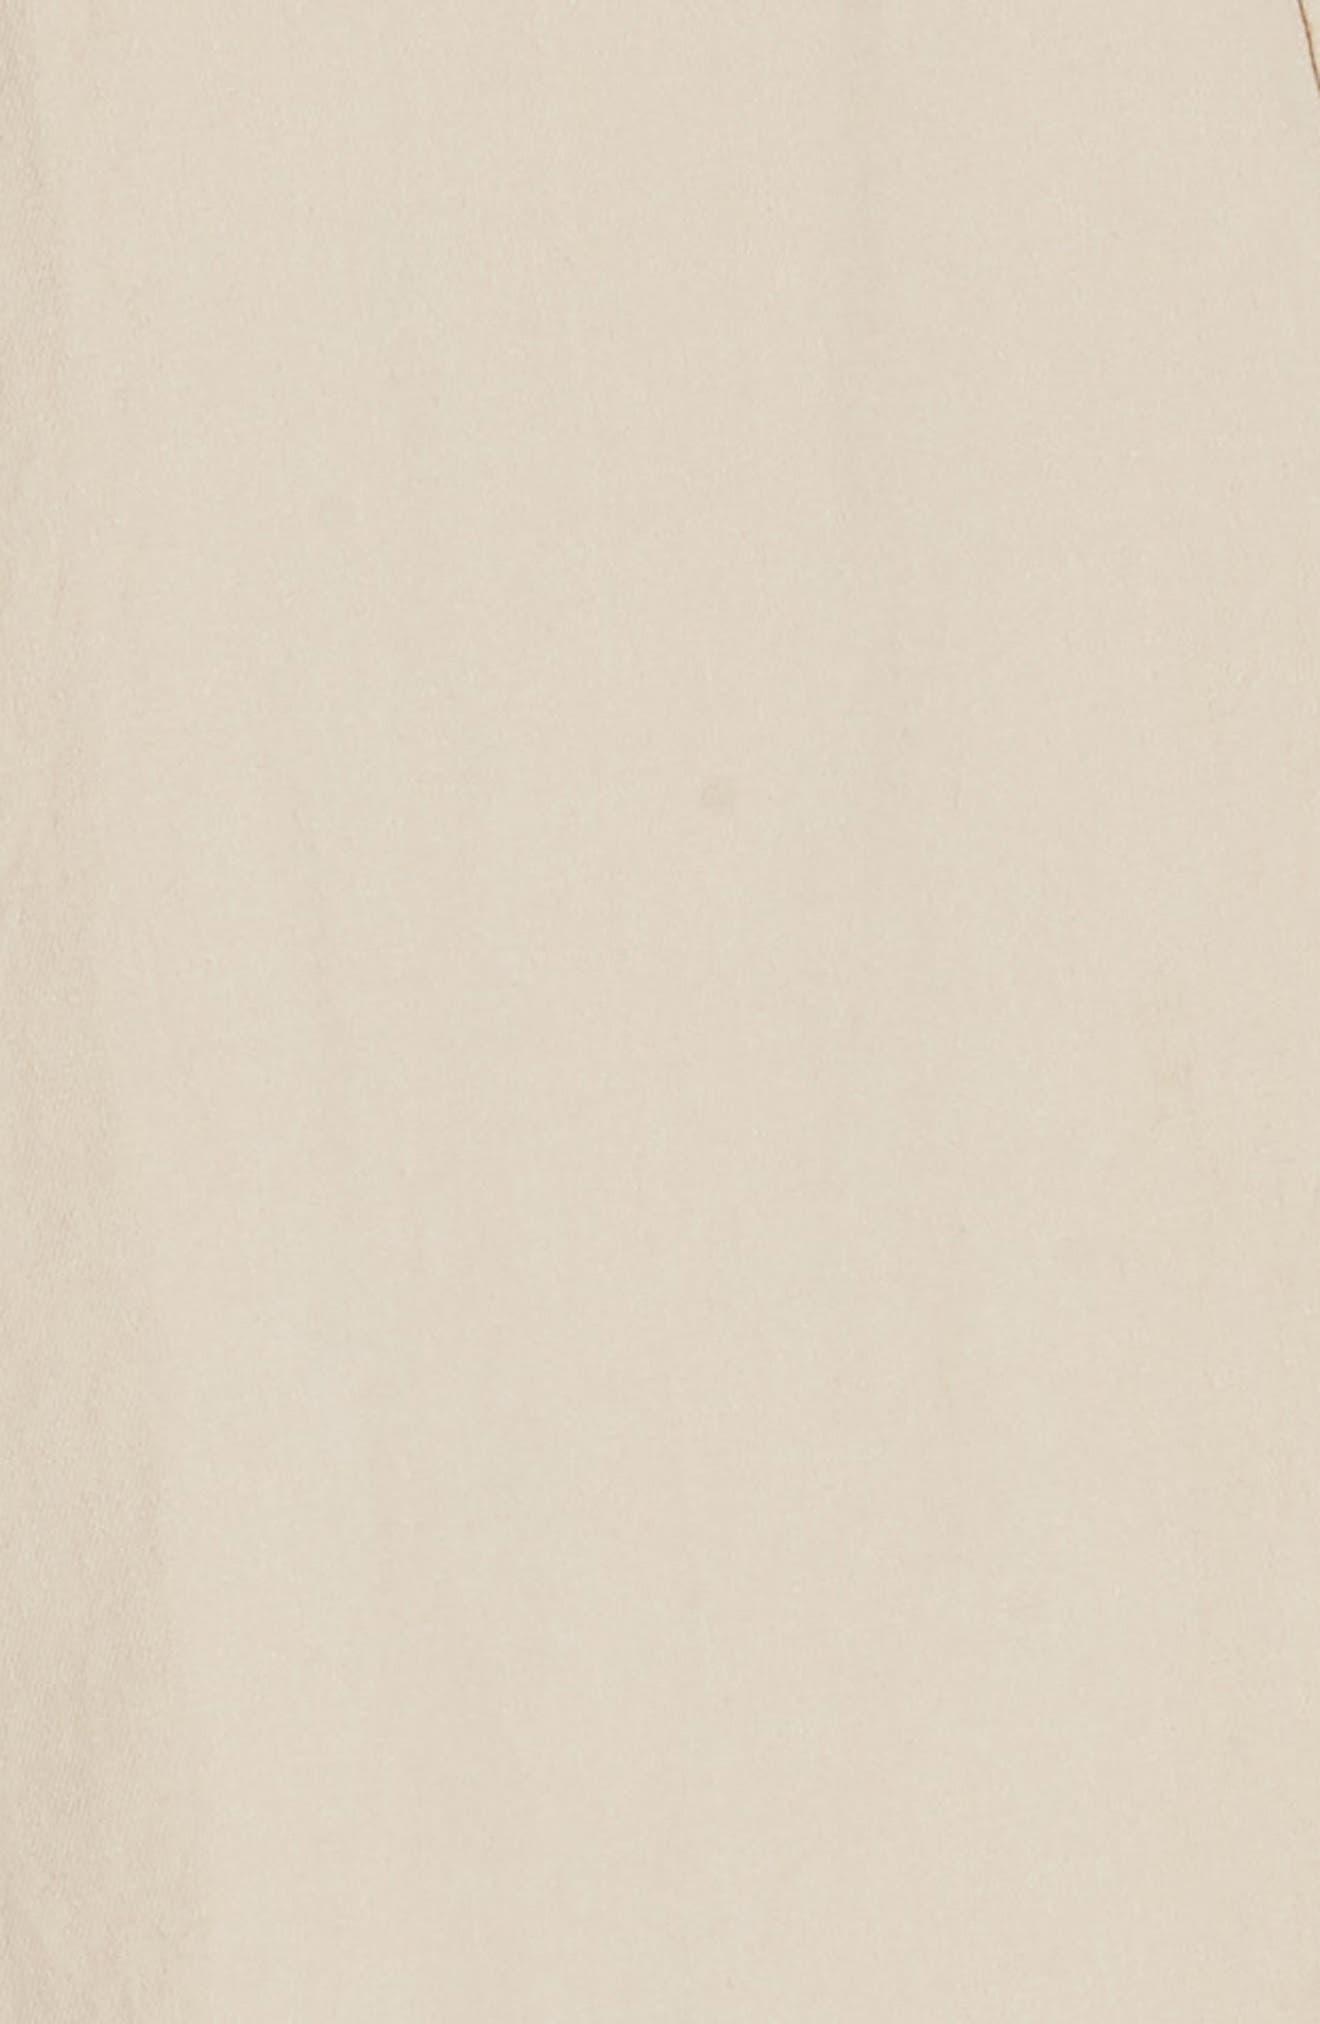 Briel Midi Dress,                             Alternate thumbnail 9, color,